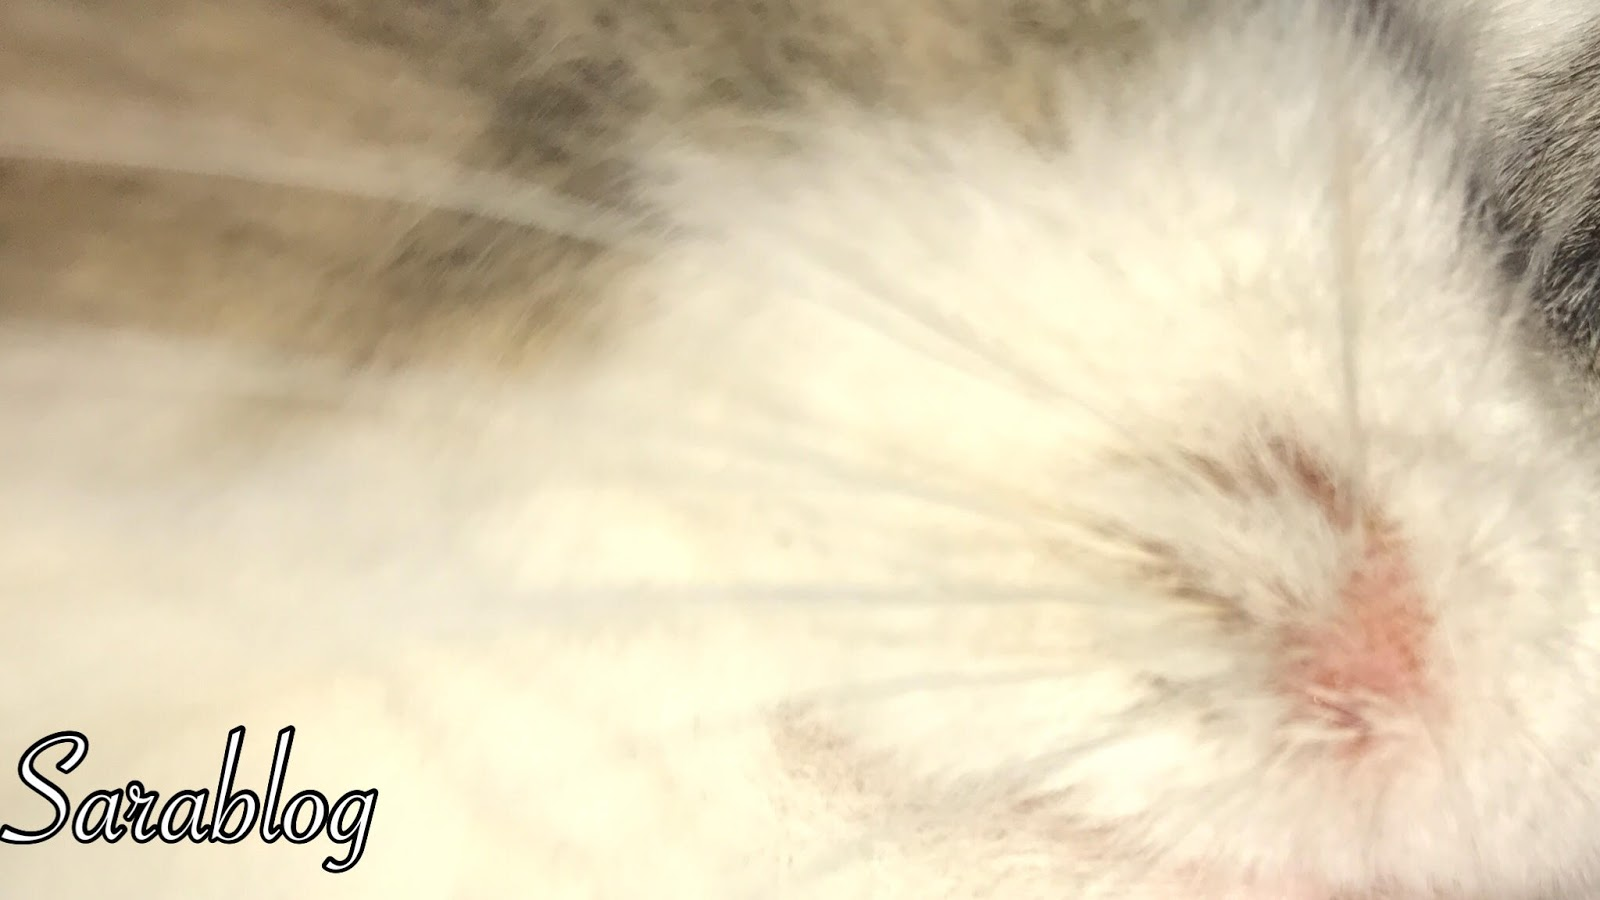 Sara Blog علاج فطريات القطط Feline Fungi